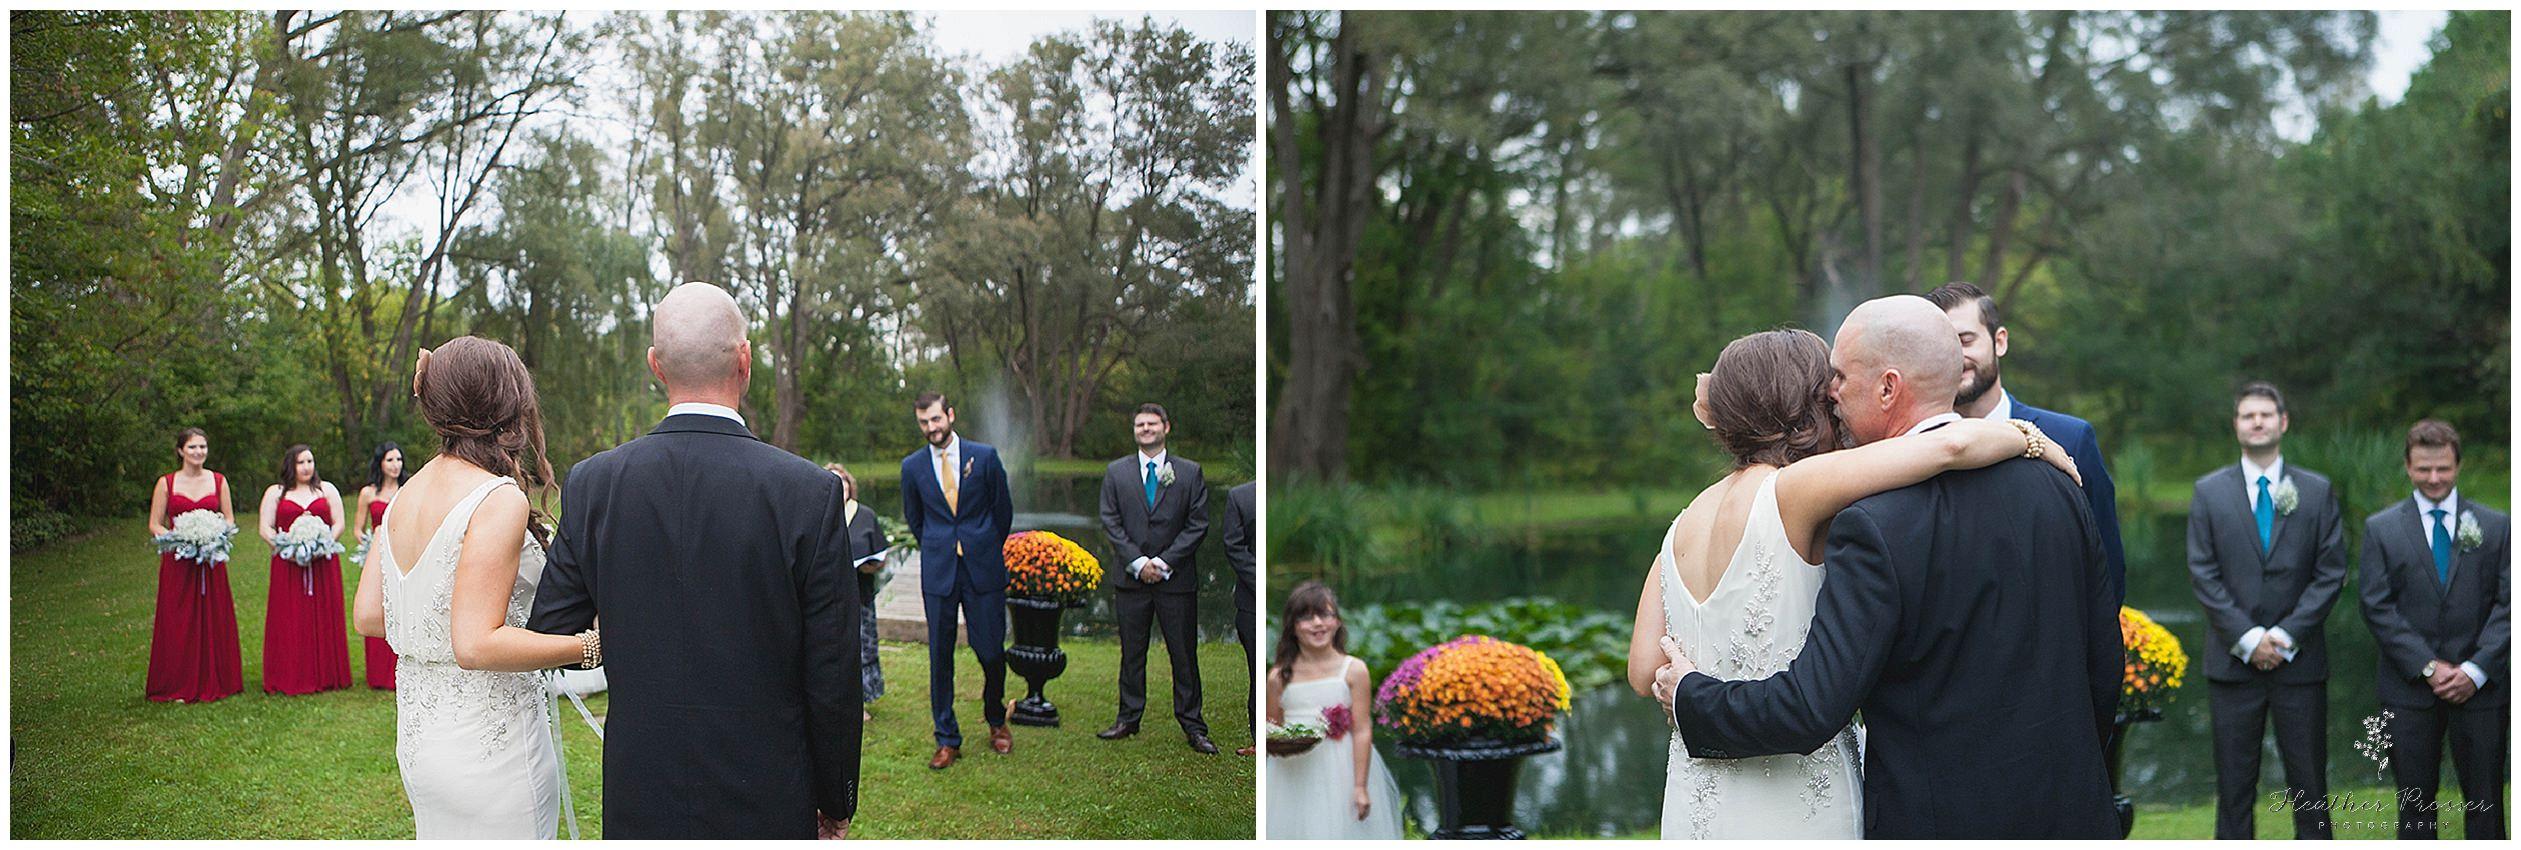 Bowmanville Wedding Photography_0184.jpg